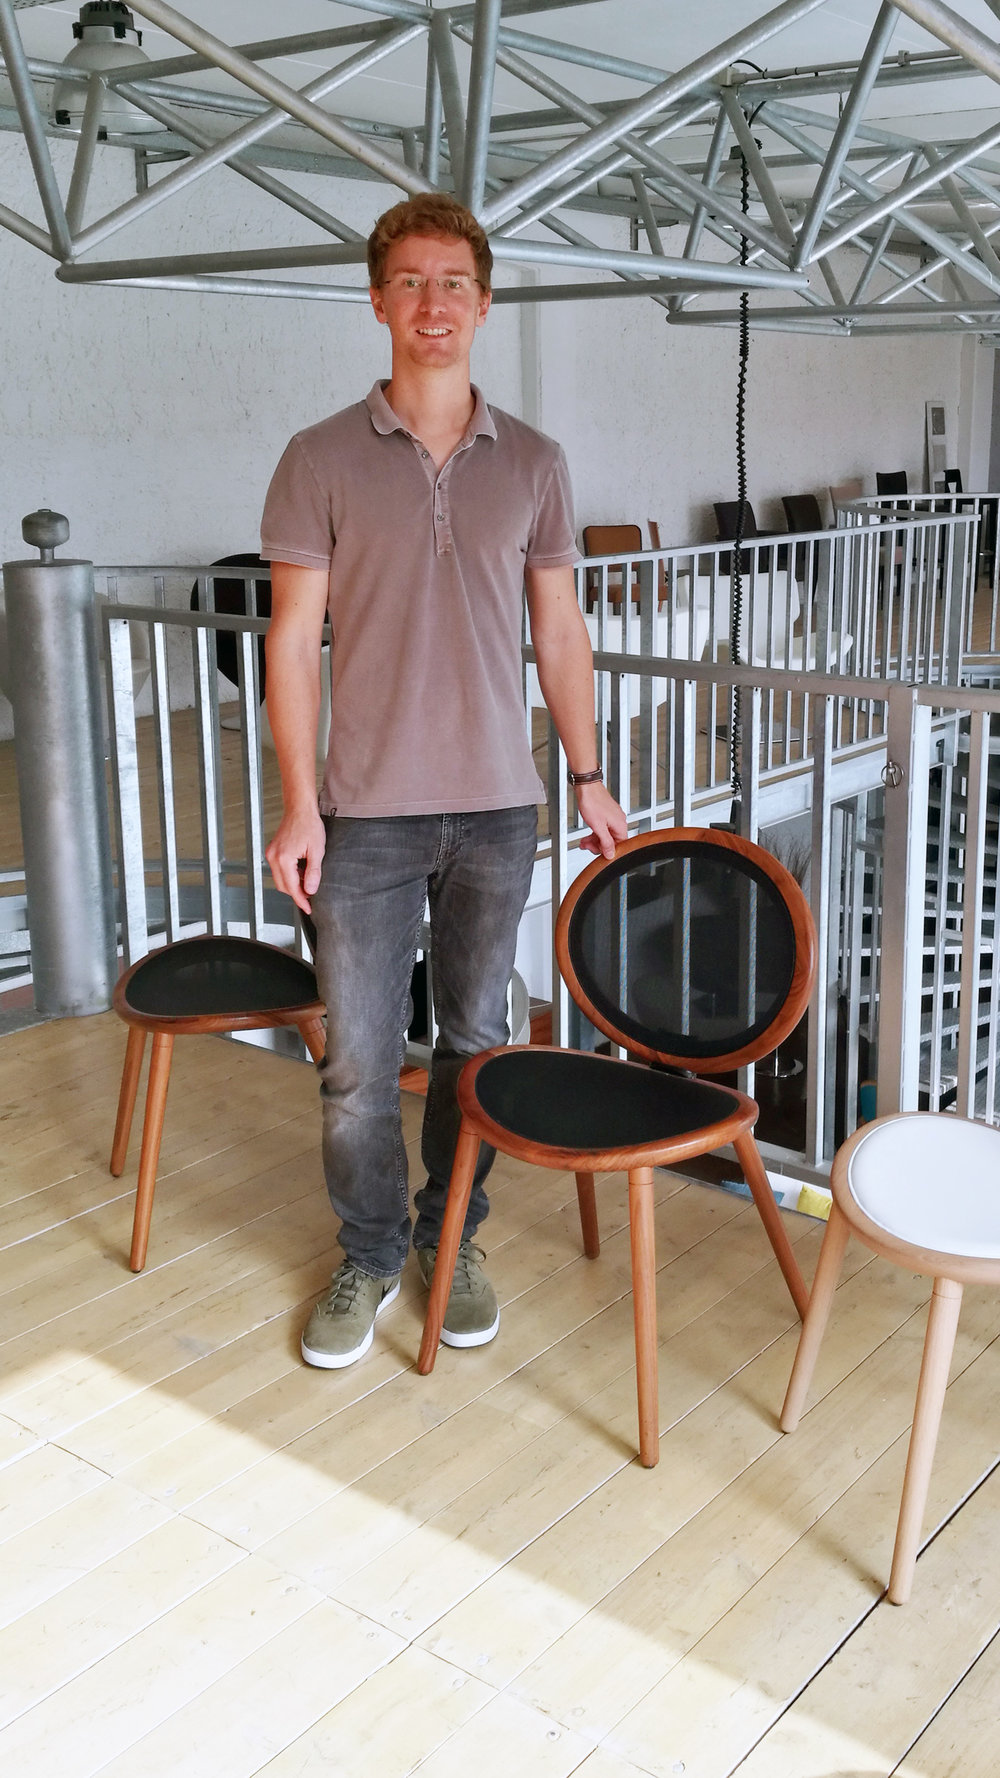 Tim-und-Stuhl-Jonathan.jpg